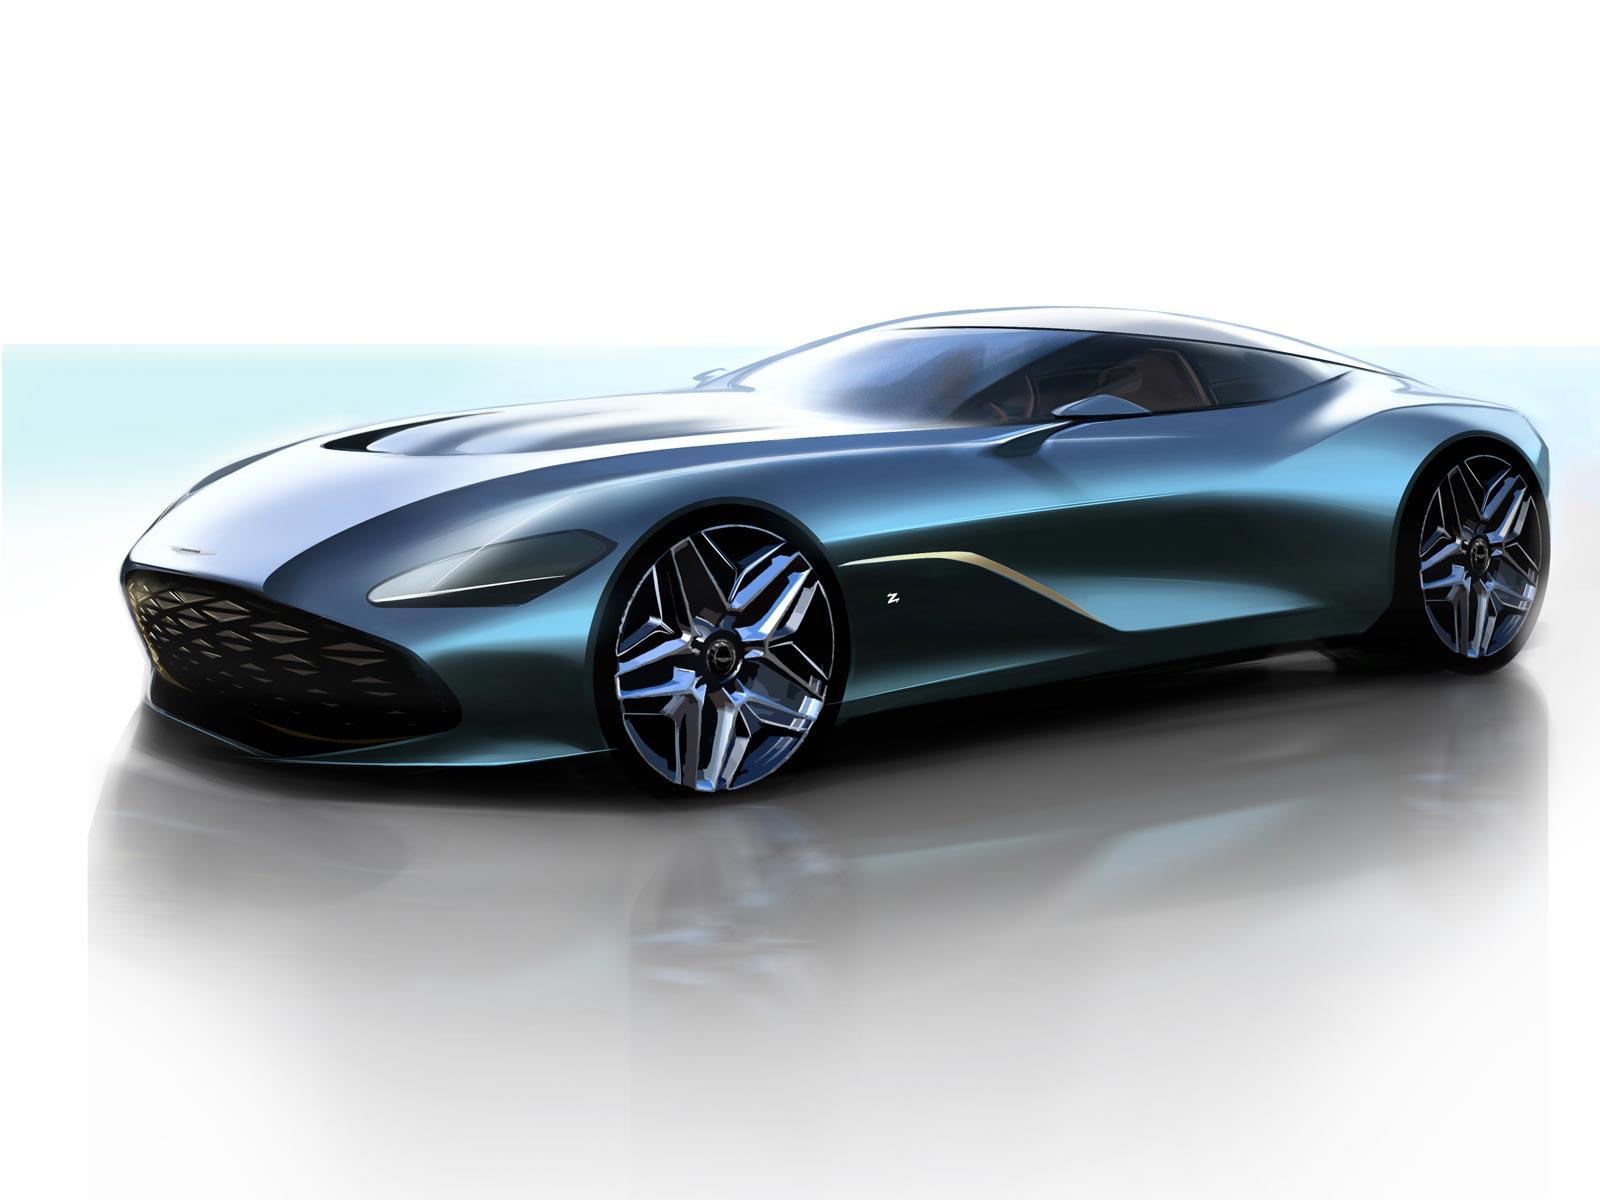 Aston Martin Dbs Gt Zagato Design Sketch Render Car Body Design